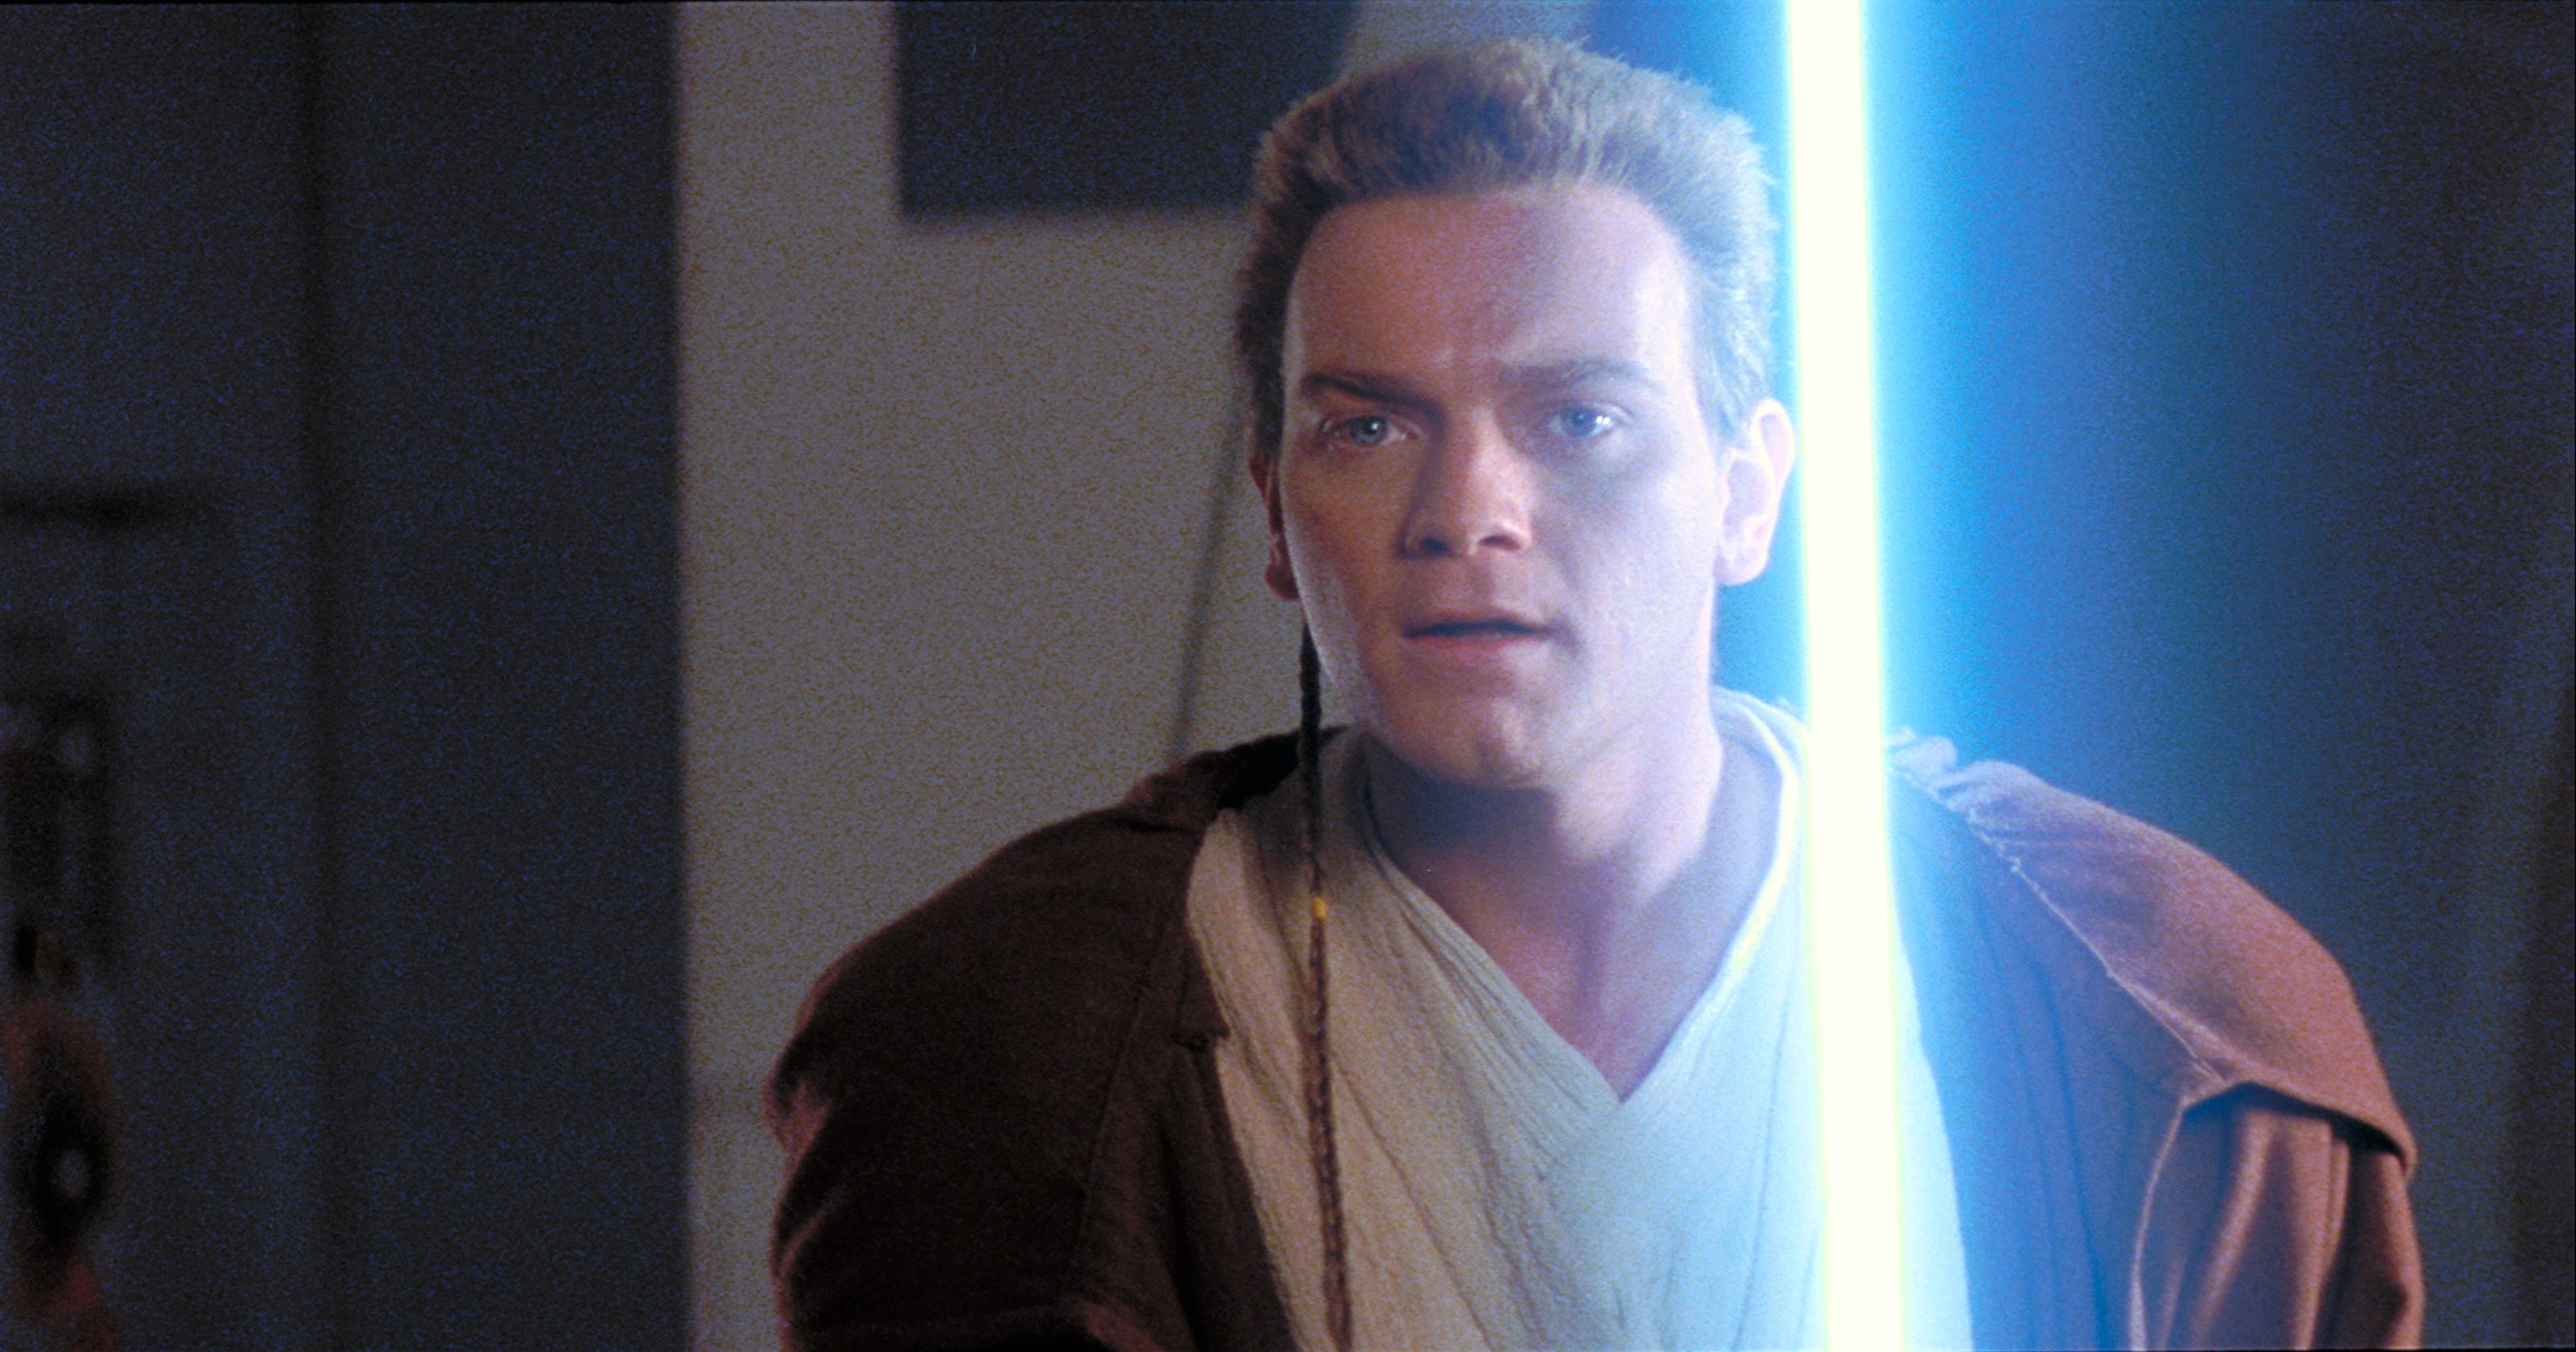 Obi-Wan Kenobi is returning! Ewan McGregor to star in Disney Plus 'Star Wars' series